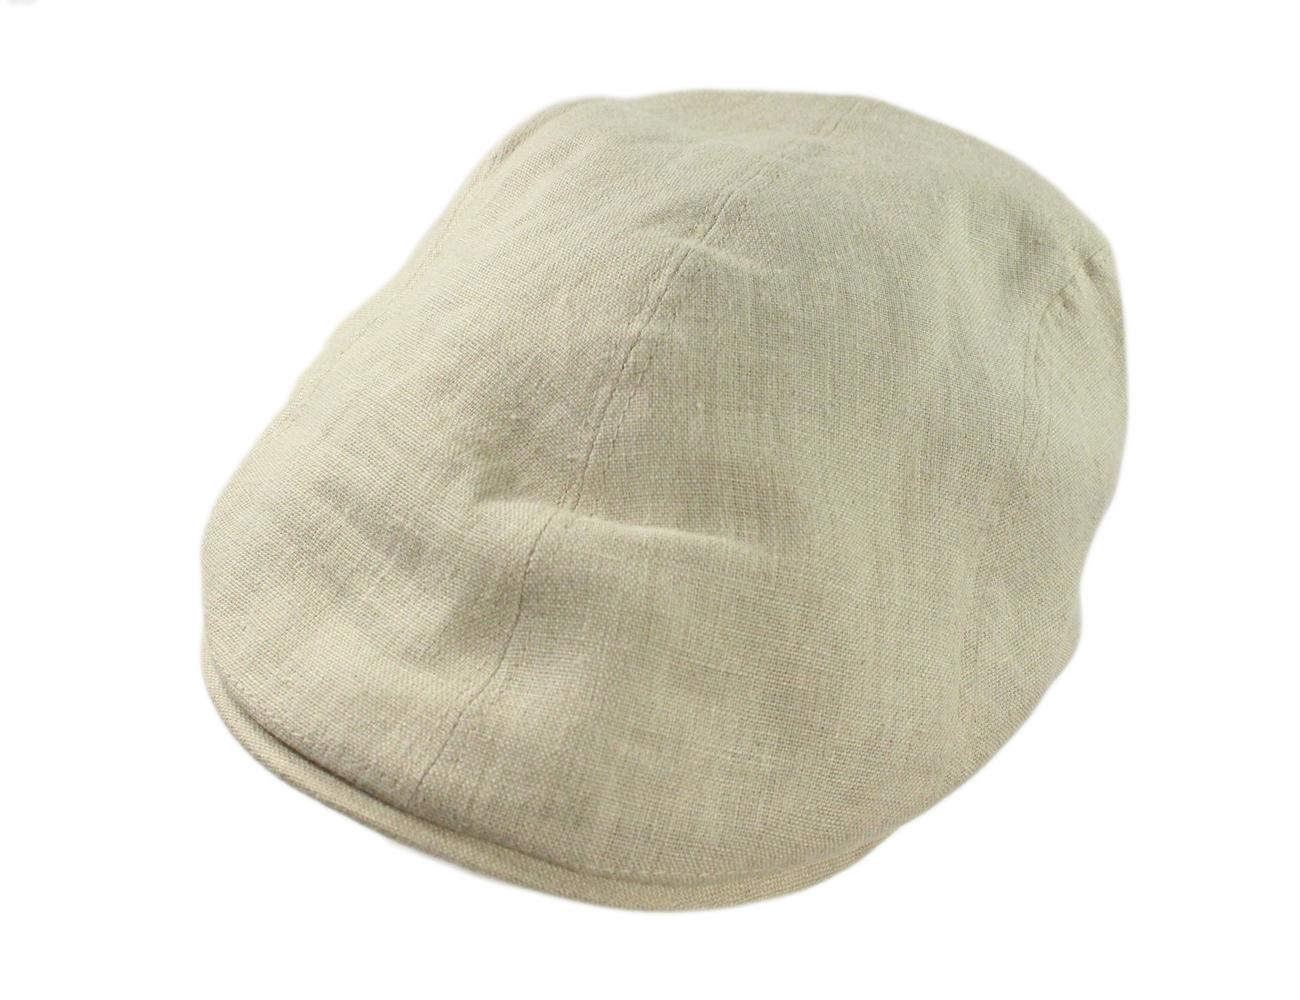 Buy Mens Summer Hat Irish Linen Made in Ireland Lc065 Achill 3 XXL ... 272429d0ccb